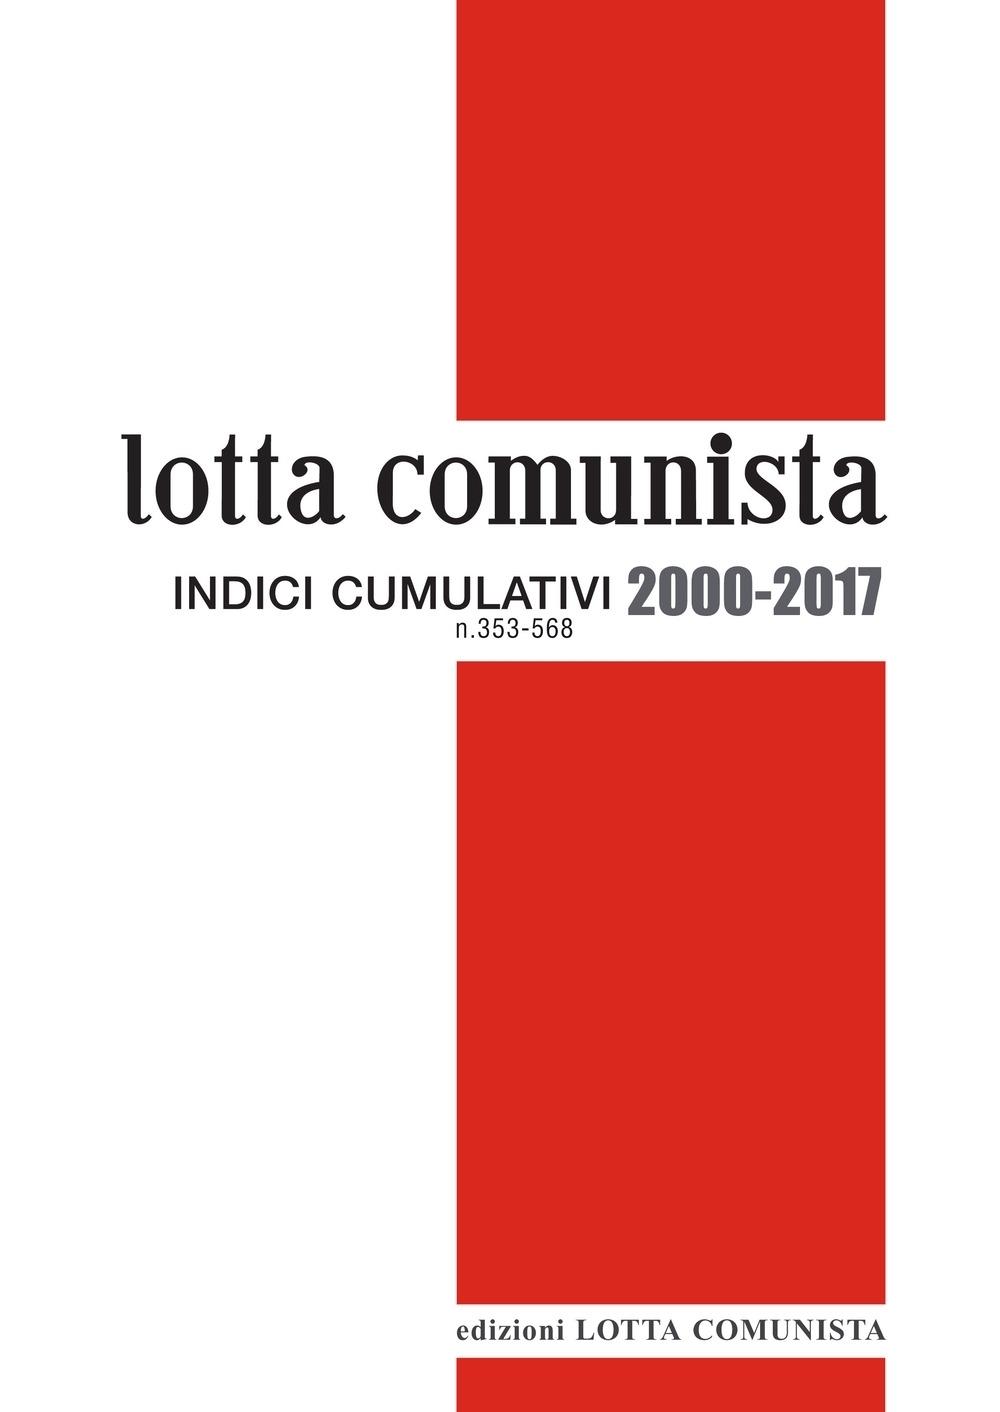 Lotta comunista. Indici cumulativi 2000-2017